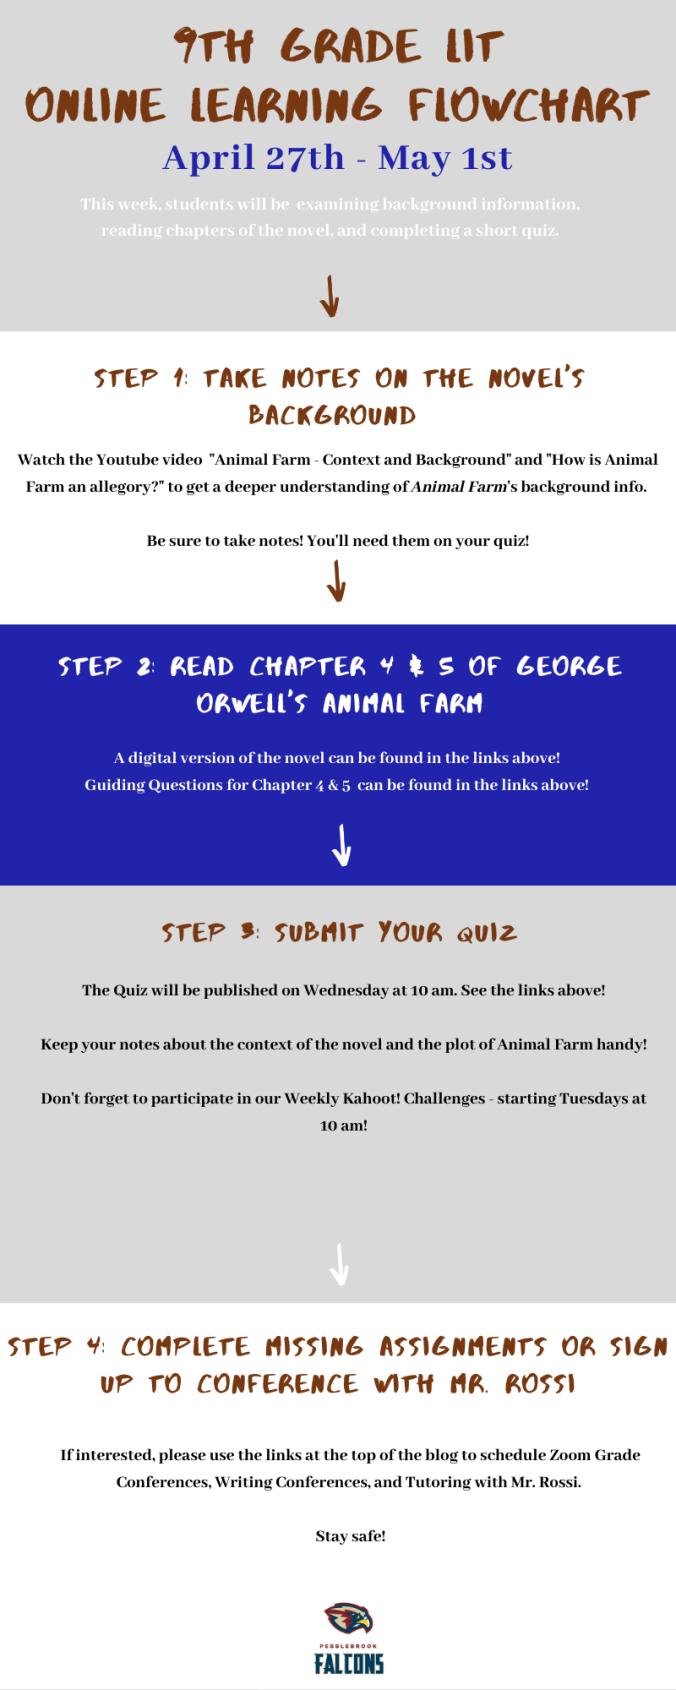 Copy of Online Learning FlowChart (6)